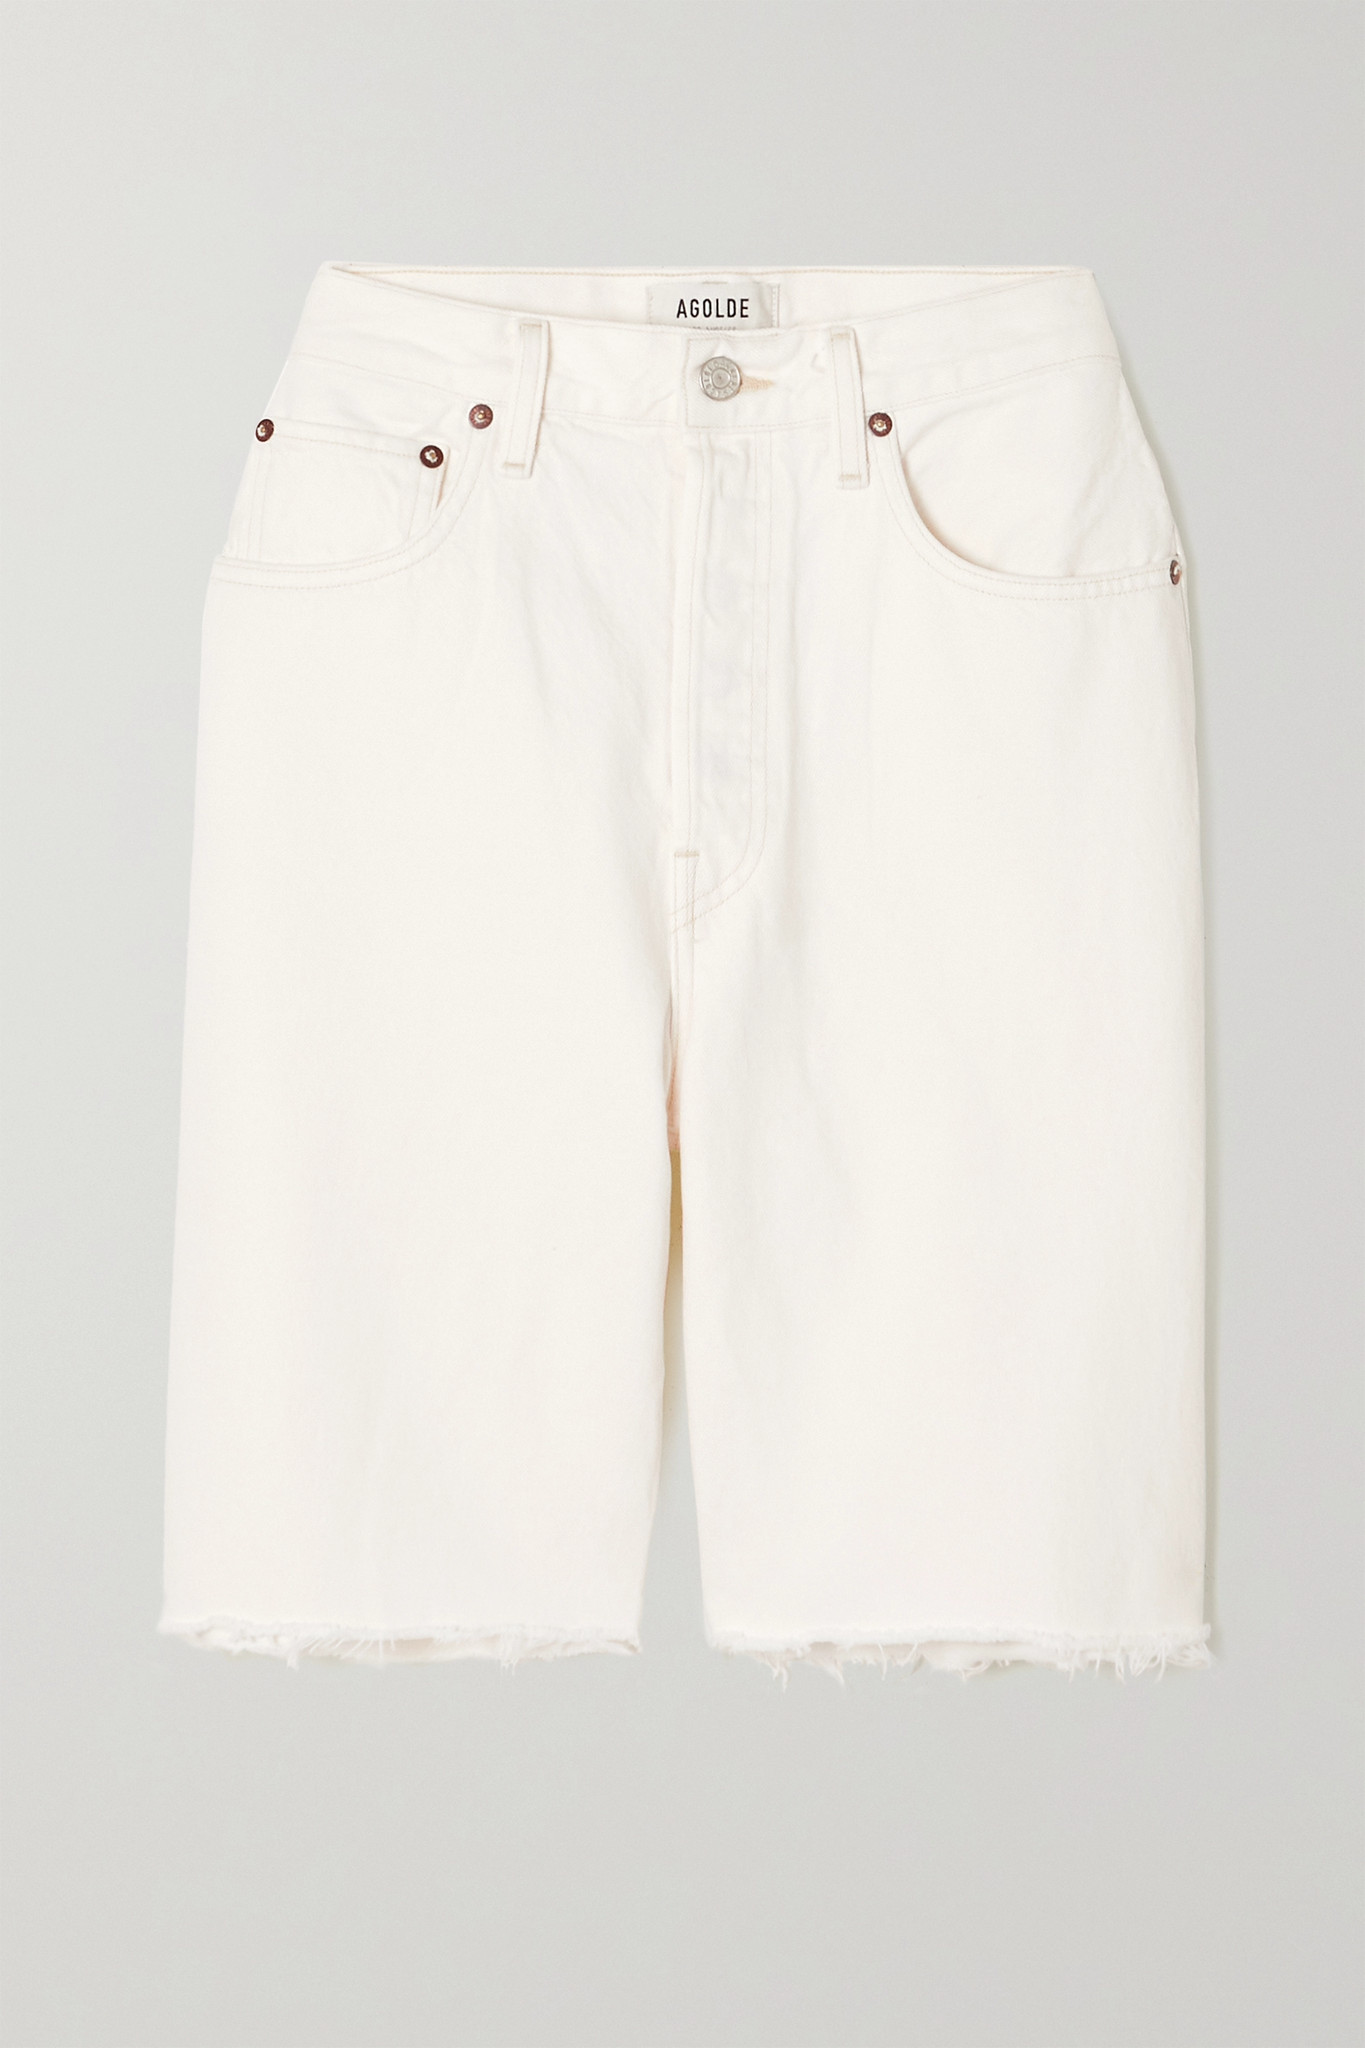 AGOLDE - '90s Pinch Distressed Denim Shorts - White - 31